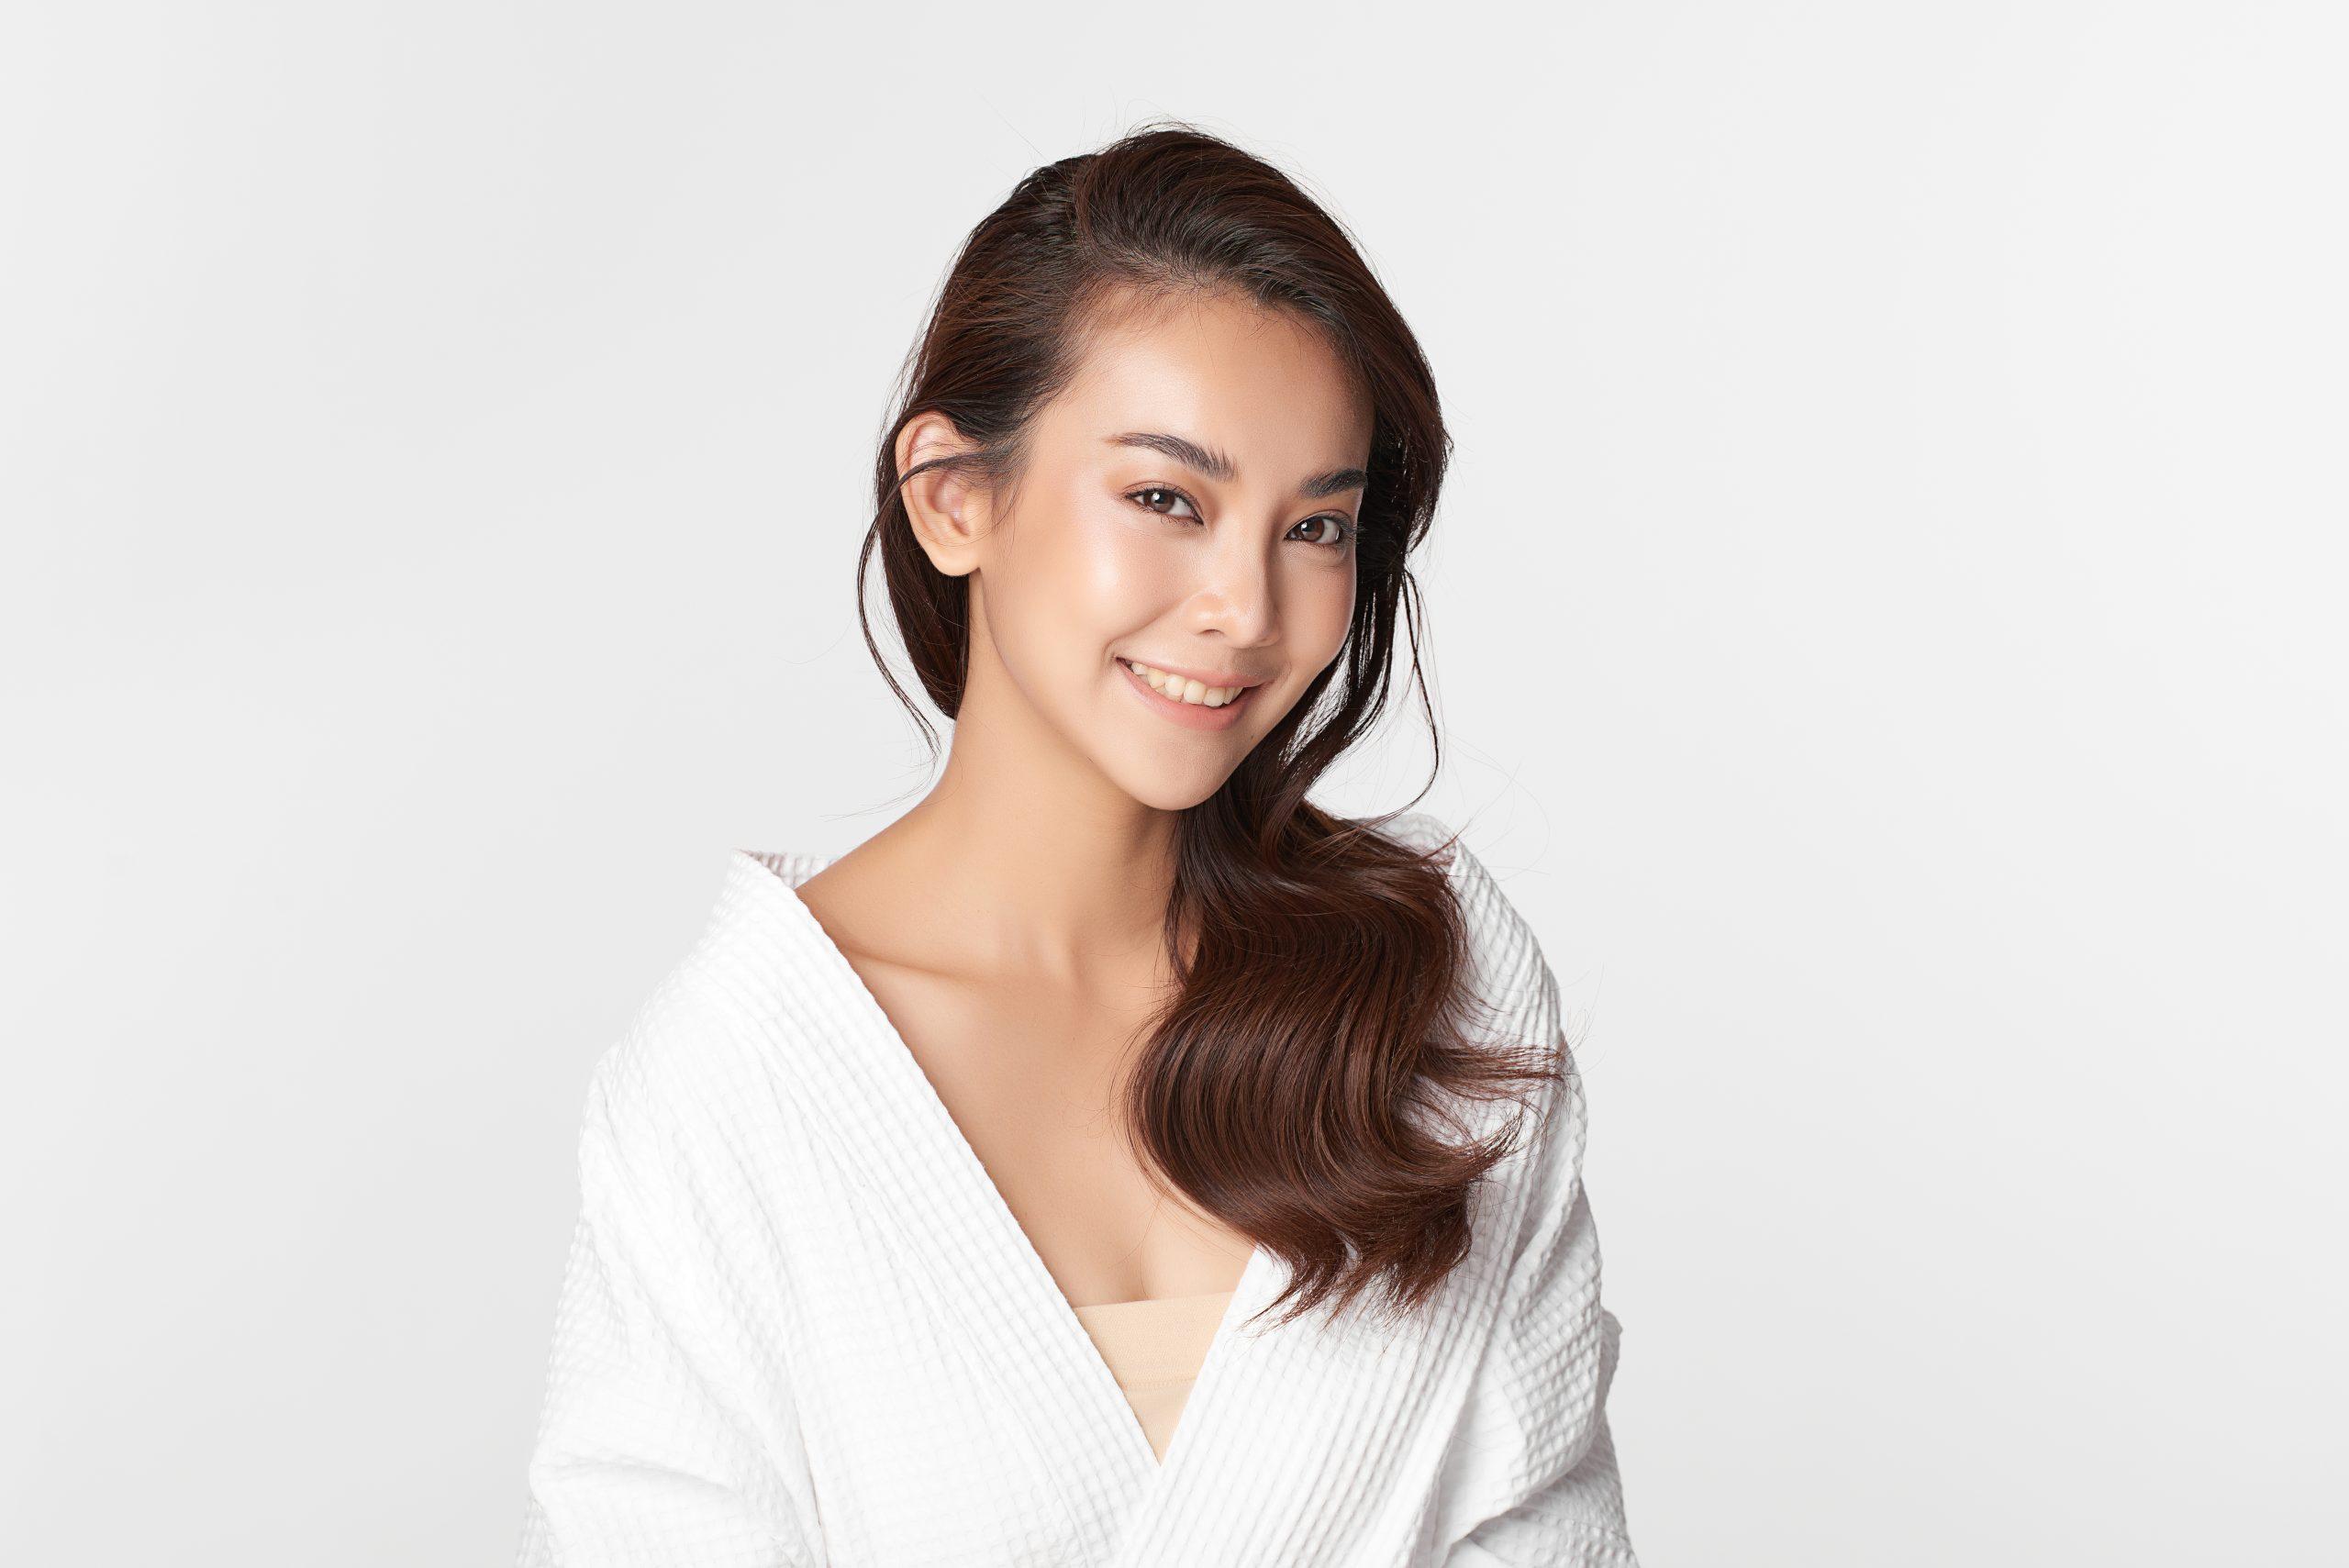 Tammy-Hotel room Massage-Asian massage Las Vegas-Asian Massage Therapists - 24 Hour Las Vegas Massage